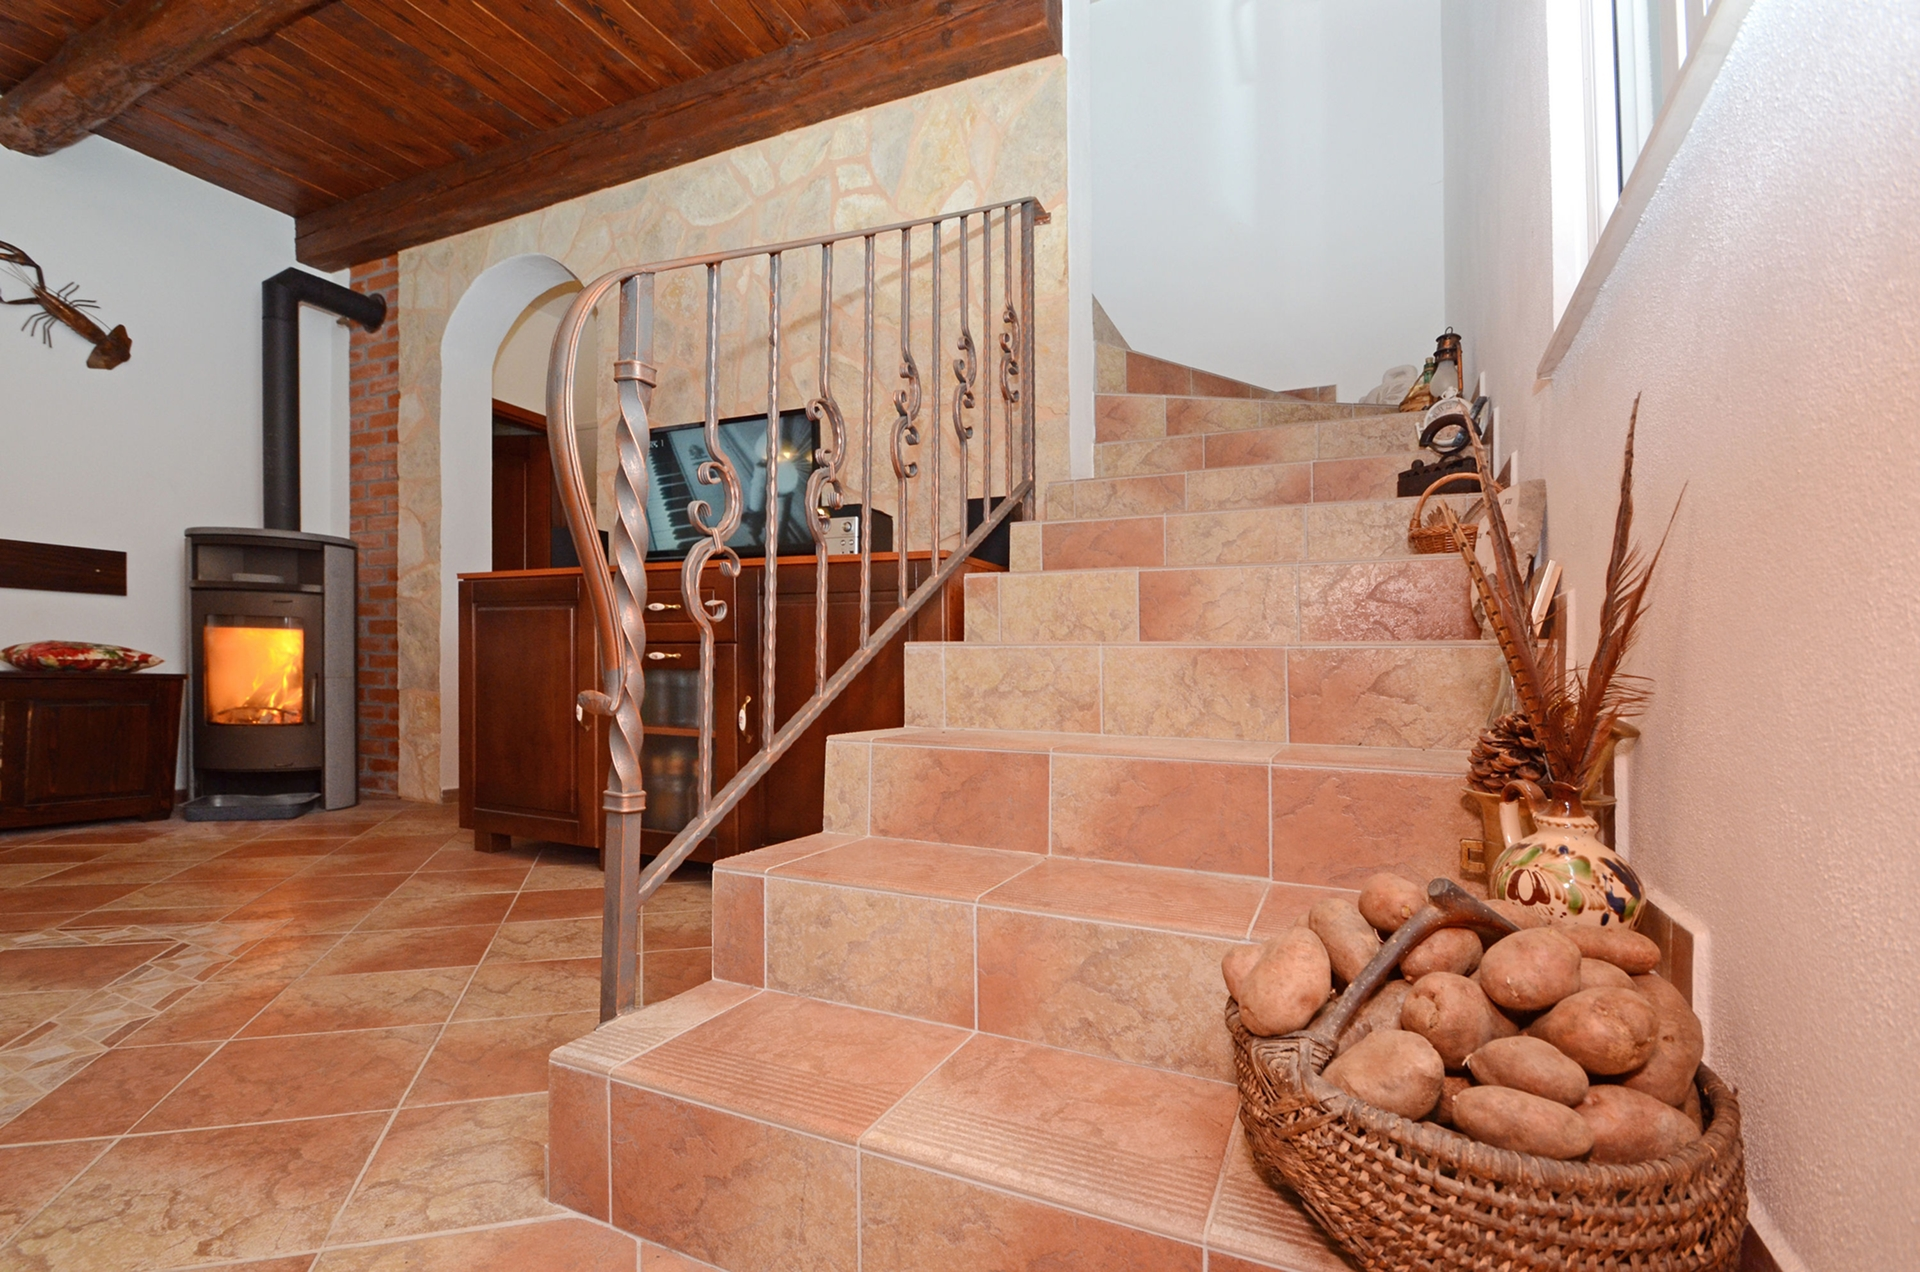 34966 - Prizba - Maisons de repos, villas Croatie